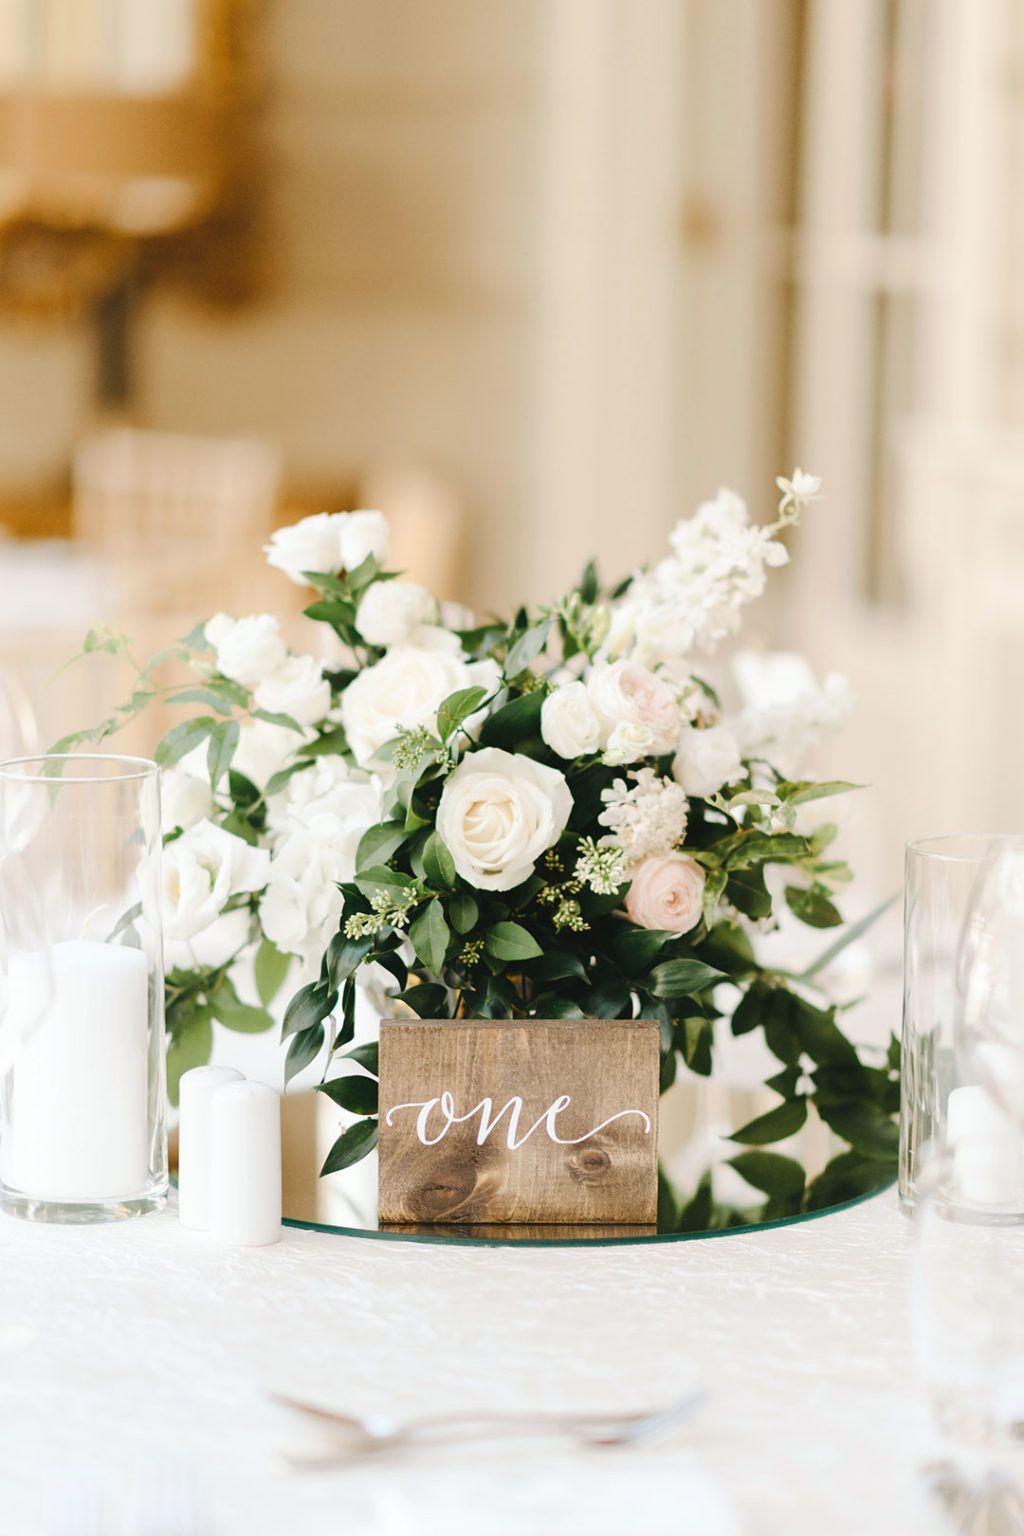 Flower Centerpieces Wedding Wedding Table Centerpieces Wedding Ta In 2020 Cheap Wedding Table Centerpieces Wedding Table Centerpieces Flower Centerpieces Wedding